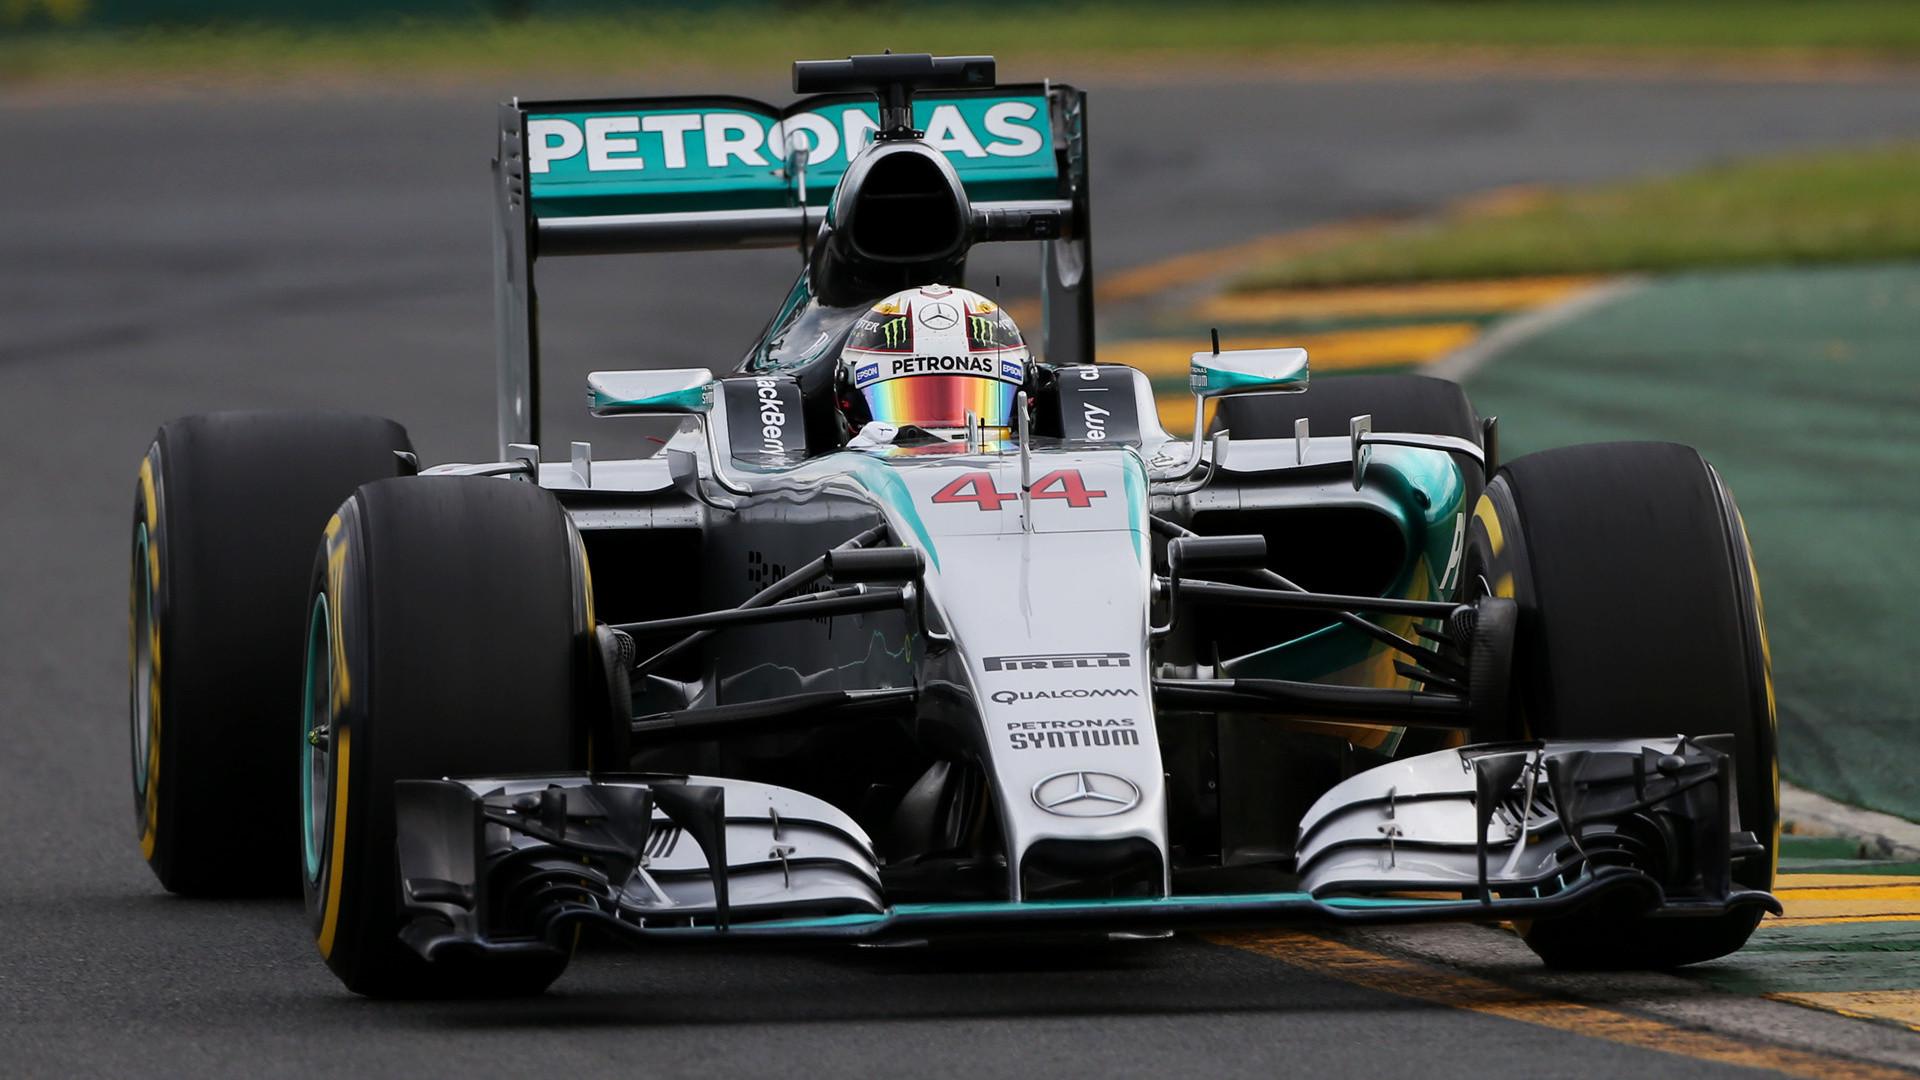 Mercedes Amg Petronas F1 Hd Hintergrundbilder 4k: 1920x1080 Wallpaper HD F1 2018 (96+ Pictures